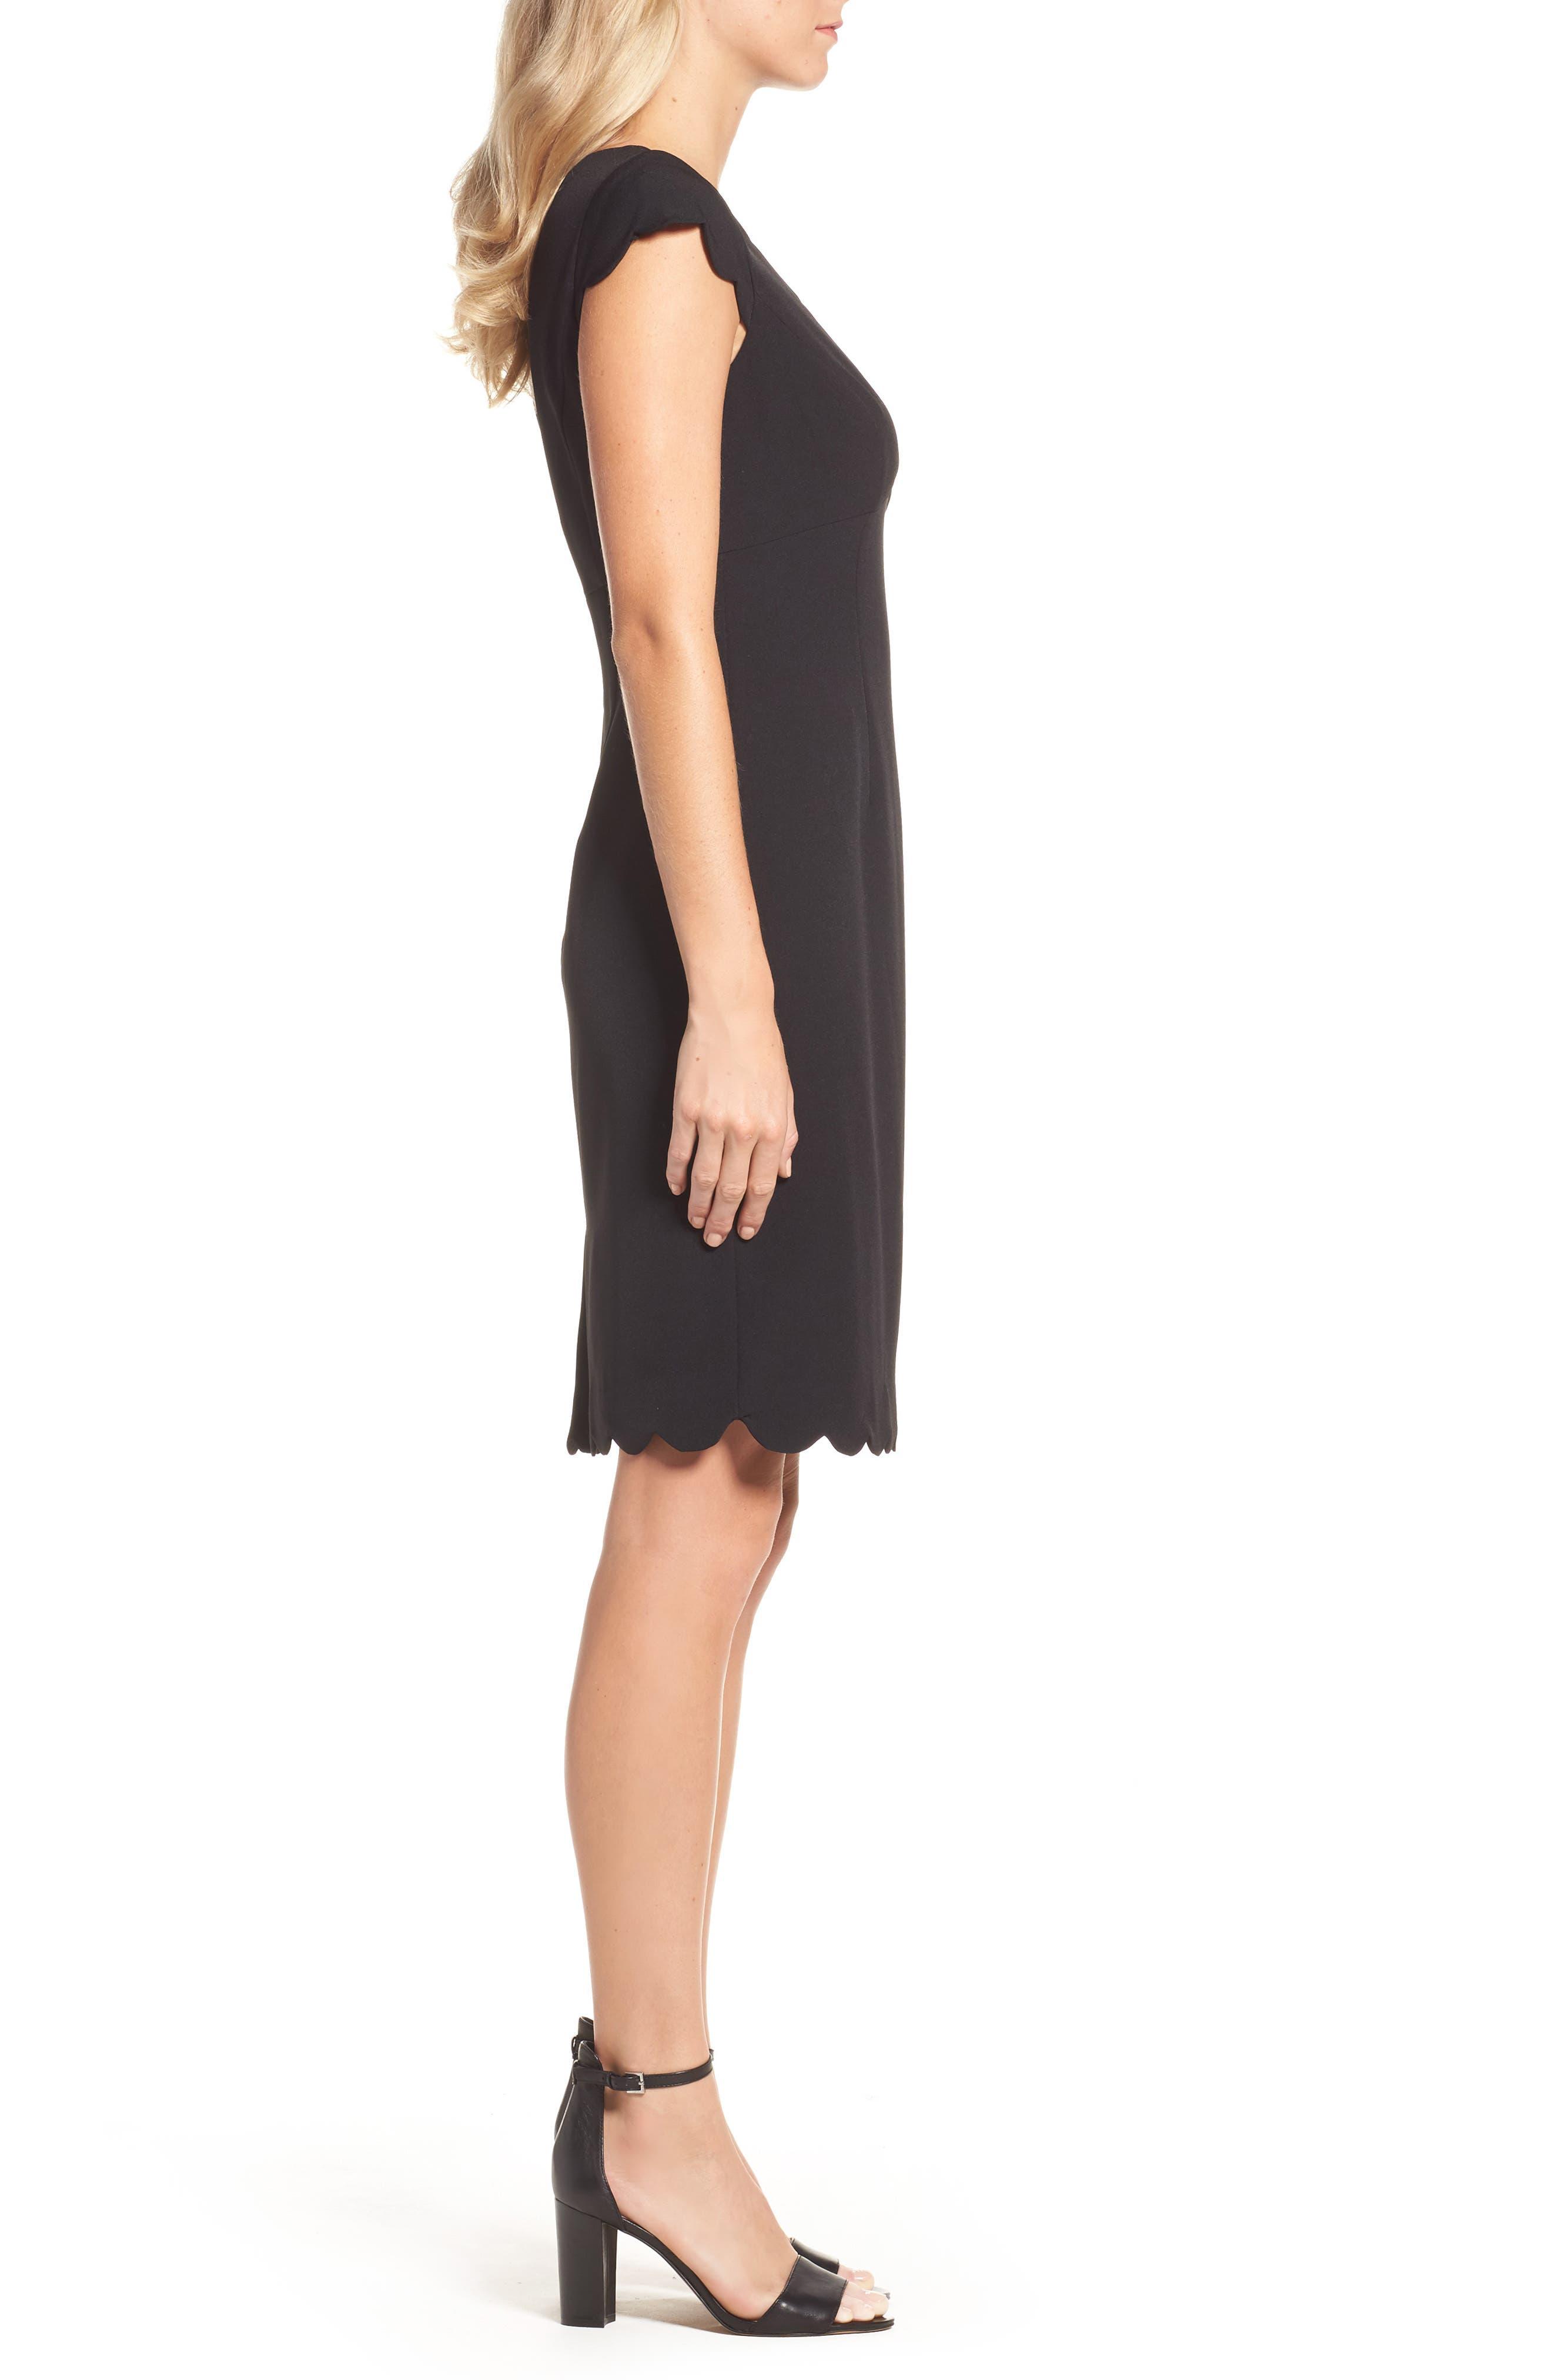 ADRIANNA PAPELL,                             Scalloped Crepe Sheath Dress,                             Alternate thumbnail 3, color,                             001